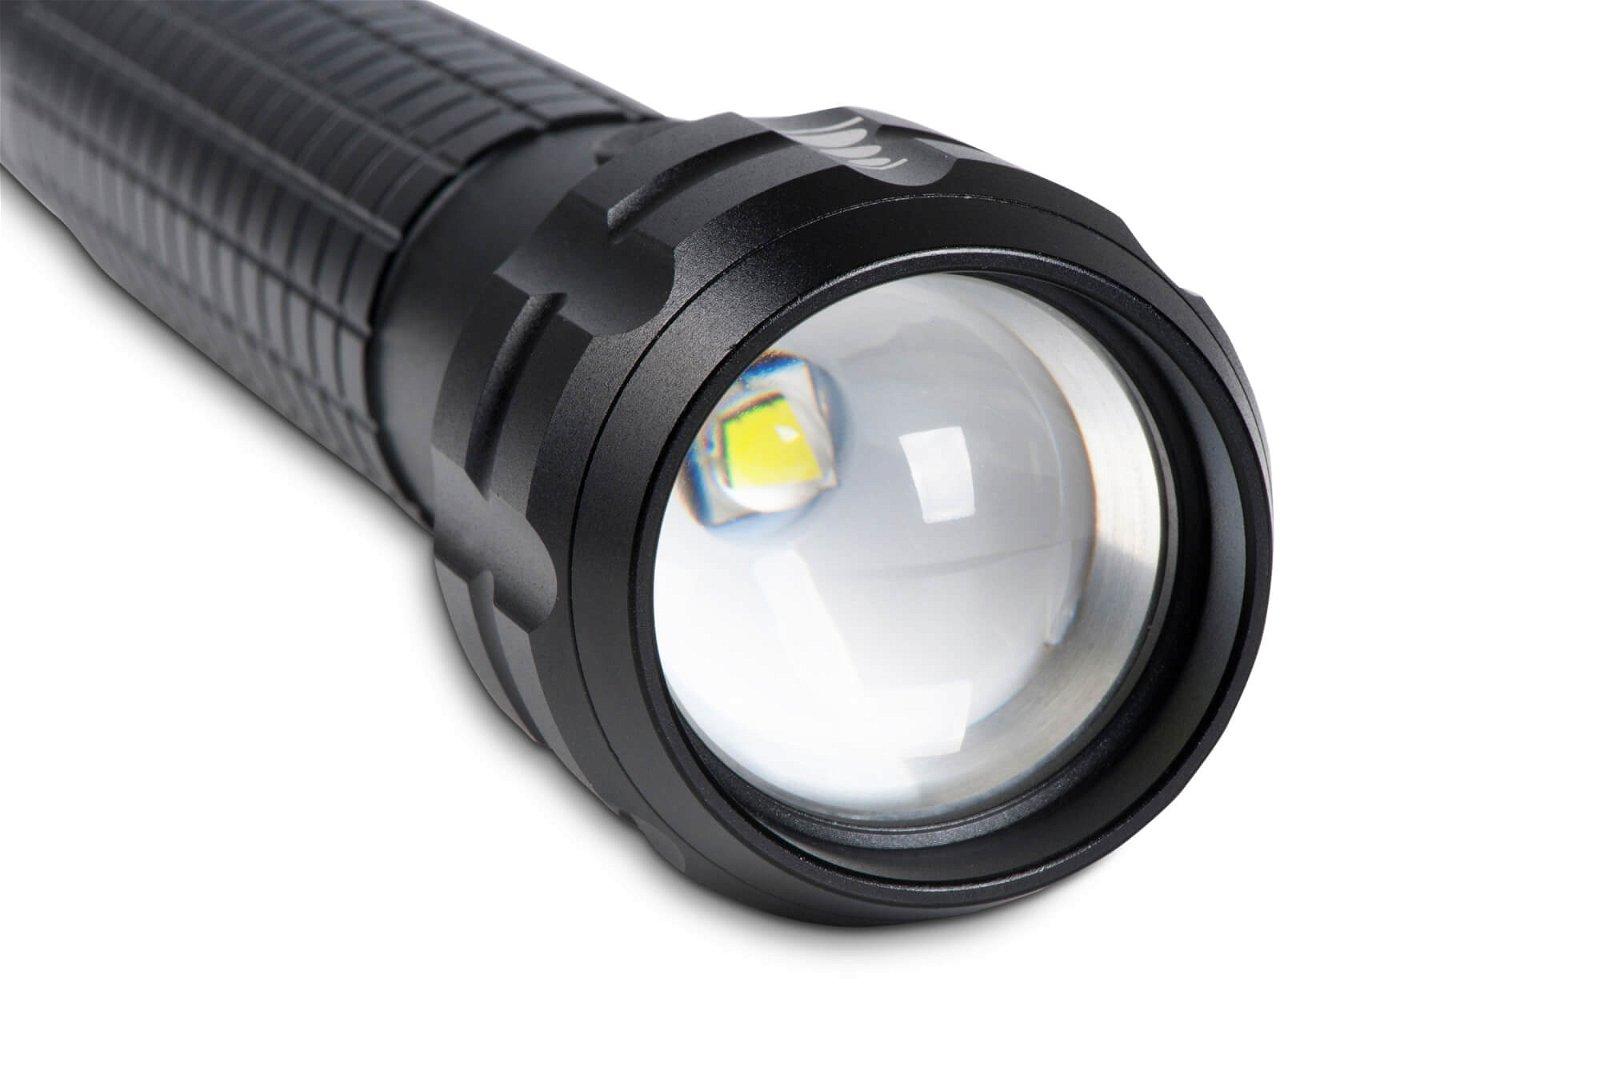 LED-Taschenlampe MAULkronos XL